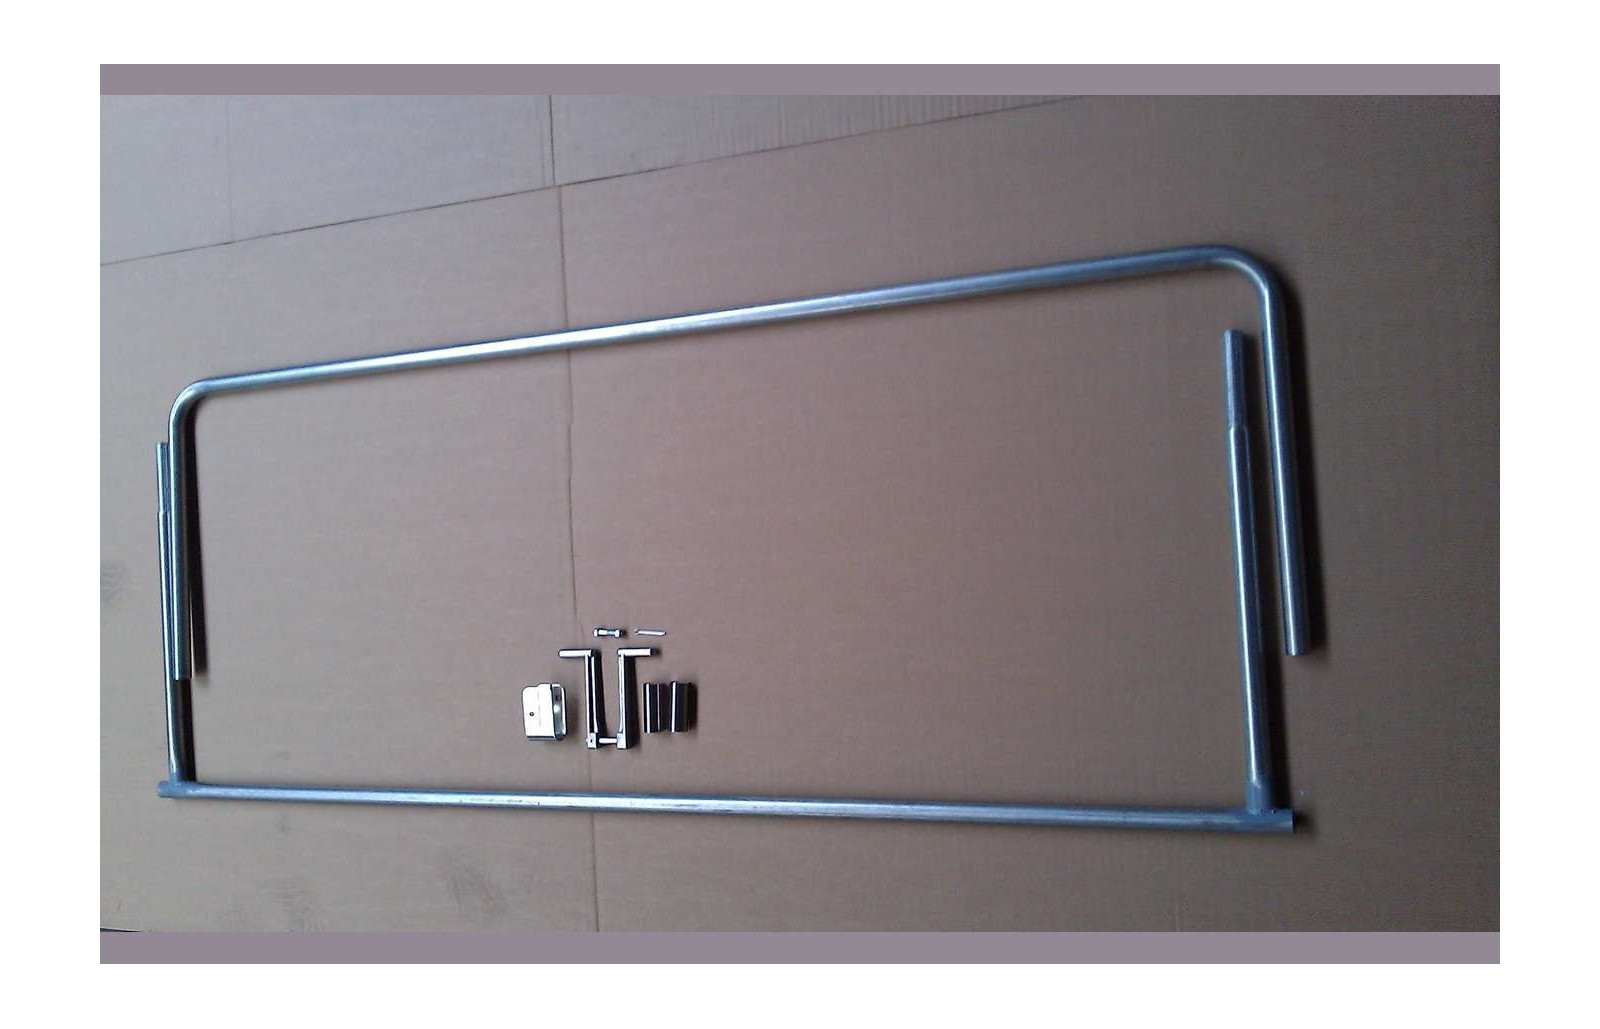 cadre de porte kit poignee serre mini serres tonneau. Black Bedroom Furniture Sets. Home Design Ideas